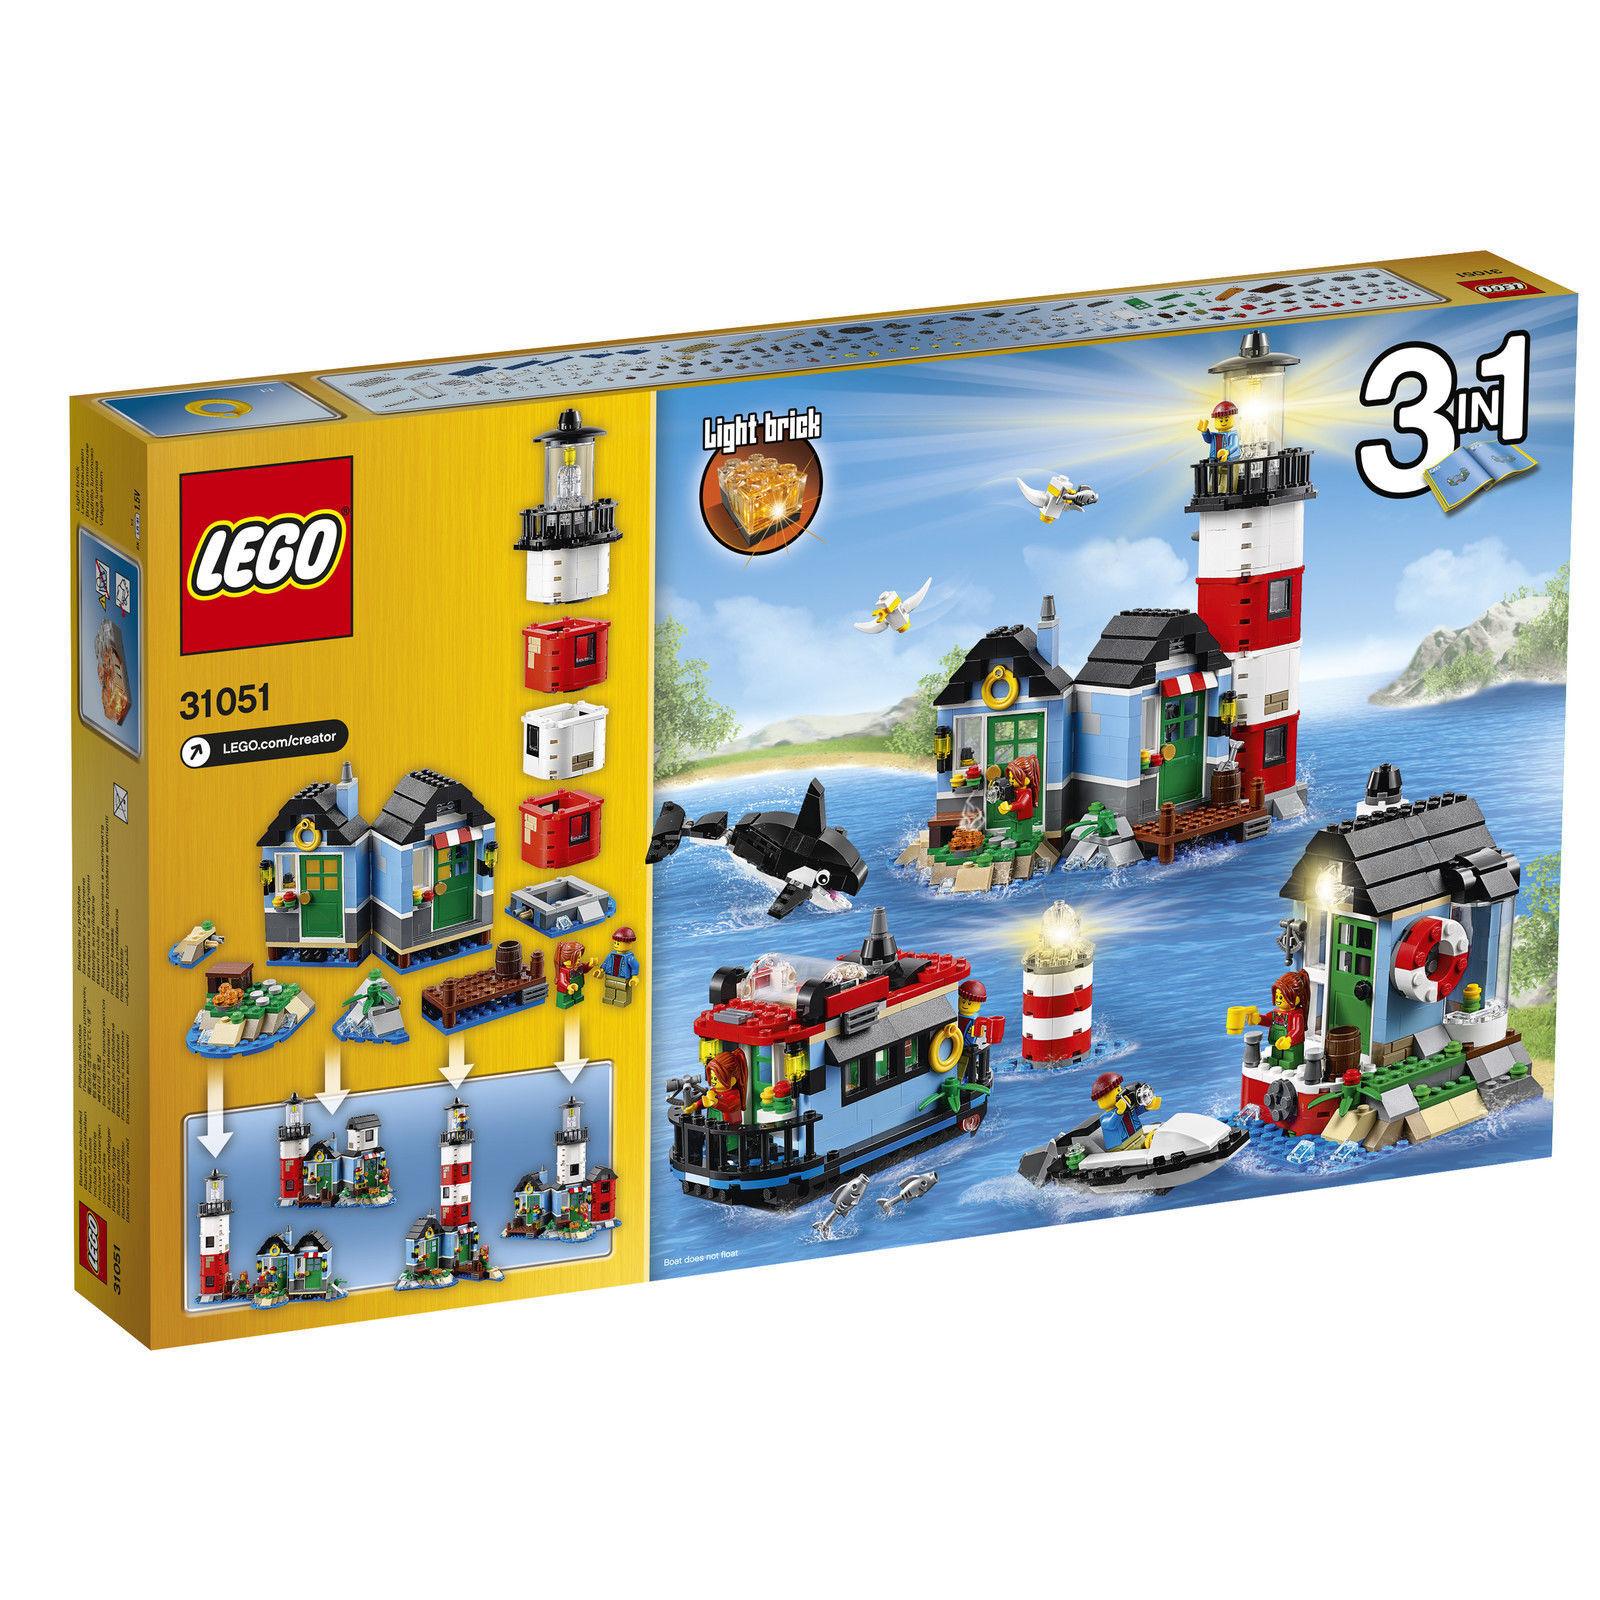 Creator Neuf Phare Boîte Sa Lego Nouveau Dans ® Île 31051 H29YEDWI